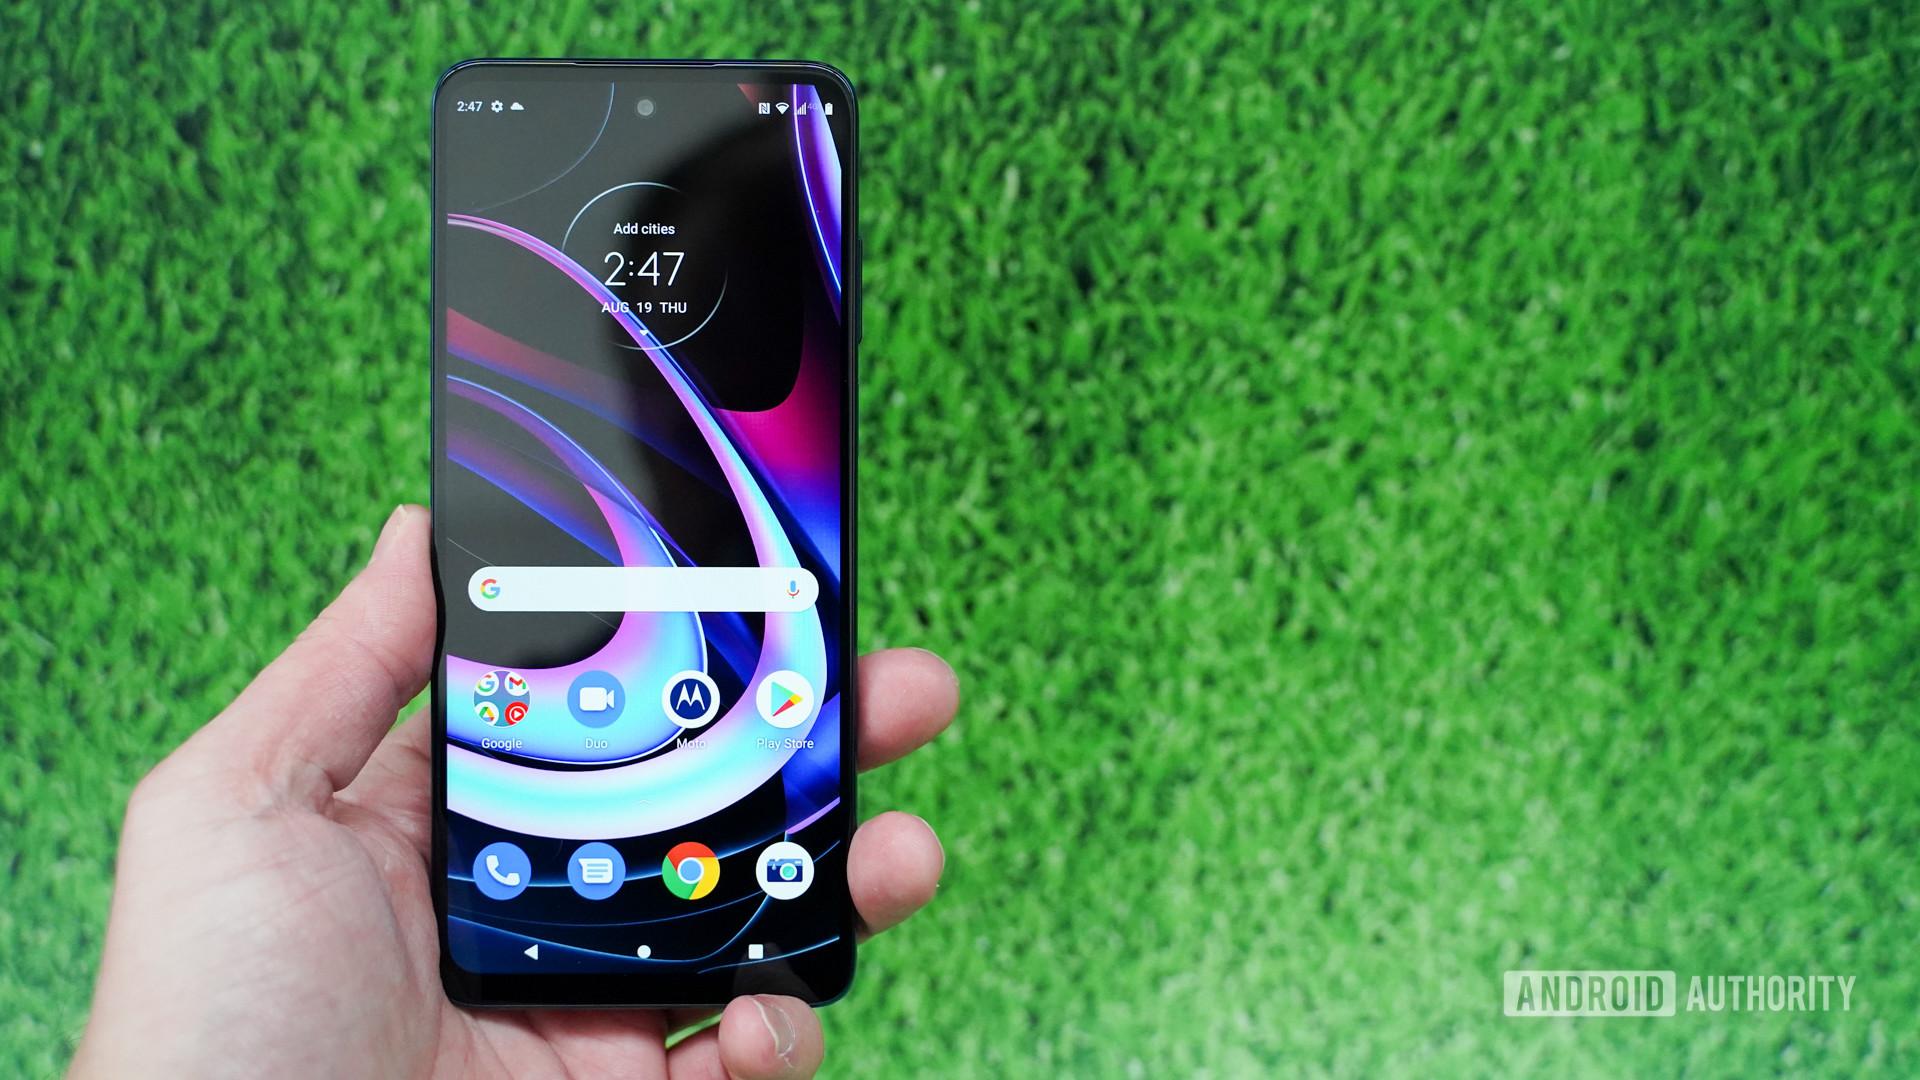 Motorola Edge screen on with green background